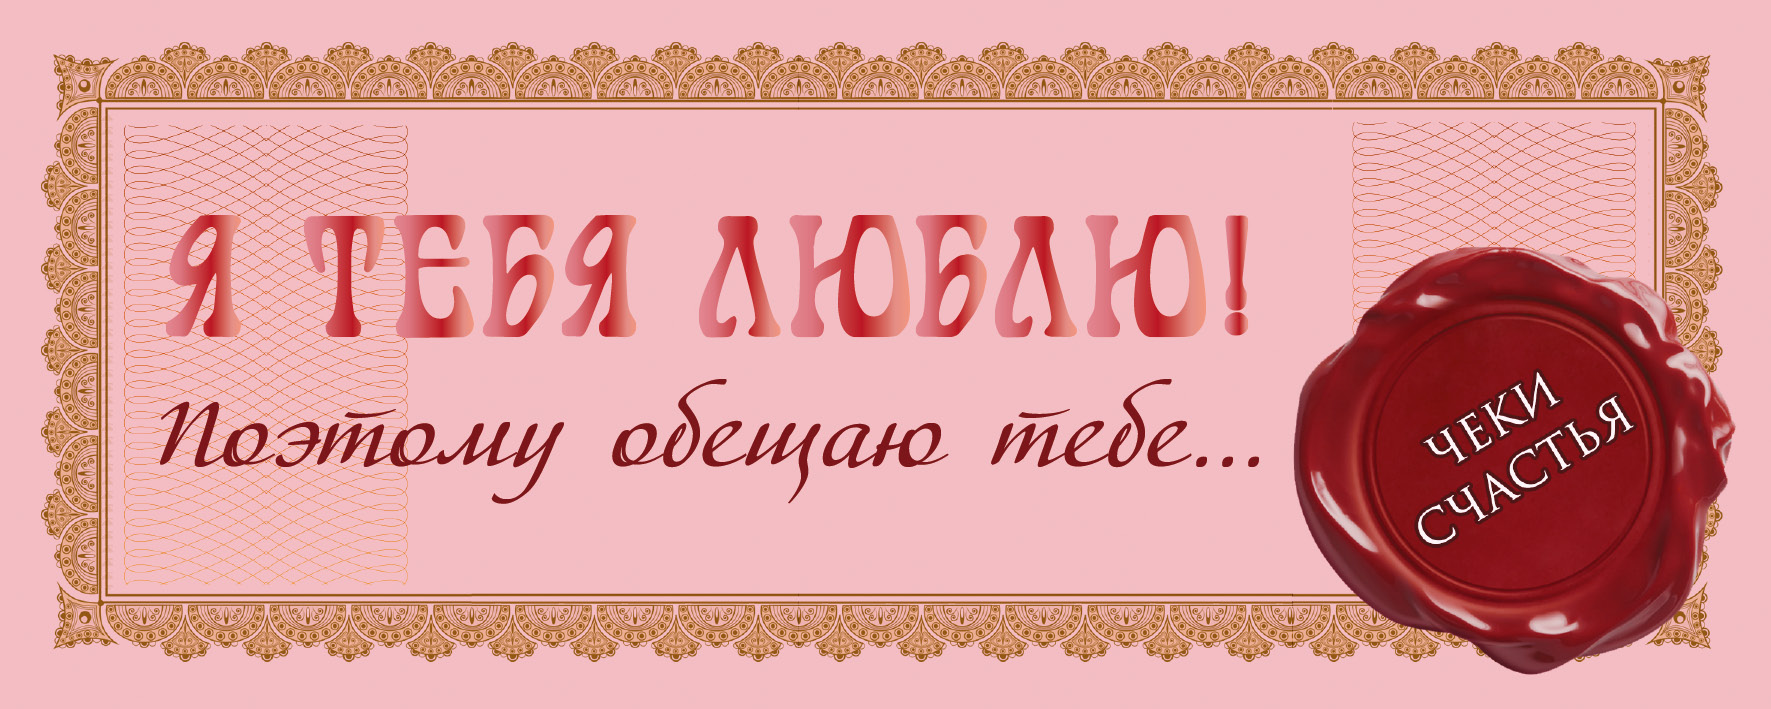 Е. А. Пилипенко Я тебя люблю! Поэтому обещаю тебе… love is любимая я обещаю тебе чеки для исполнения желаний